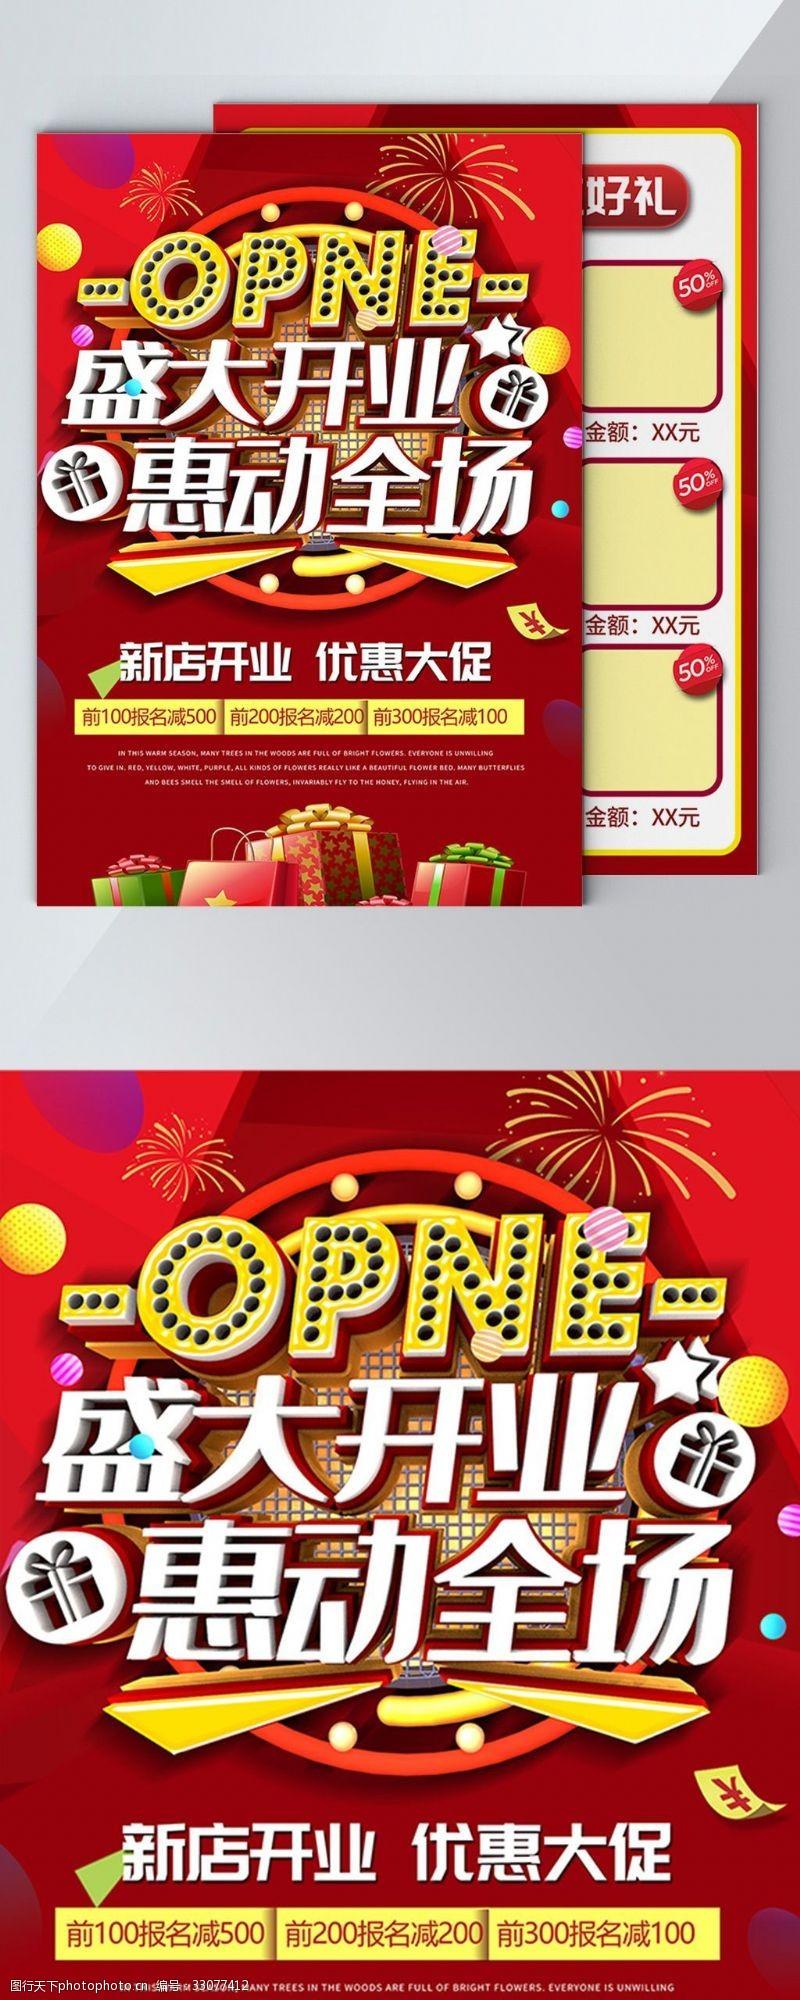 C4D紅色立體字新店開業dm宣傳單